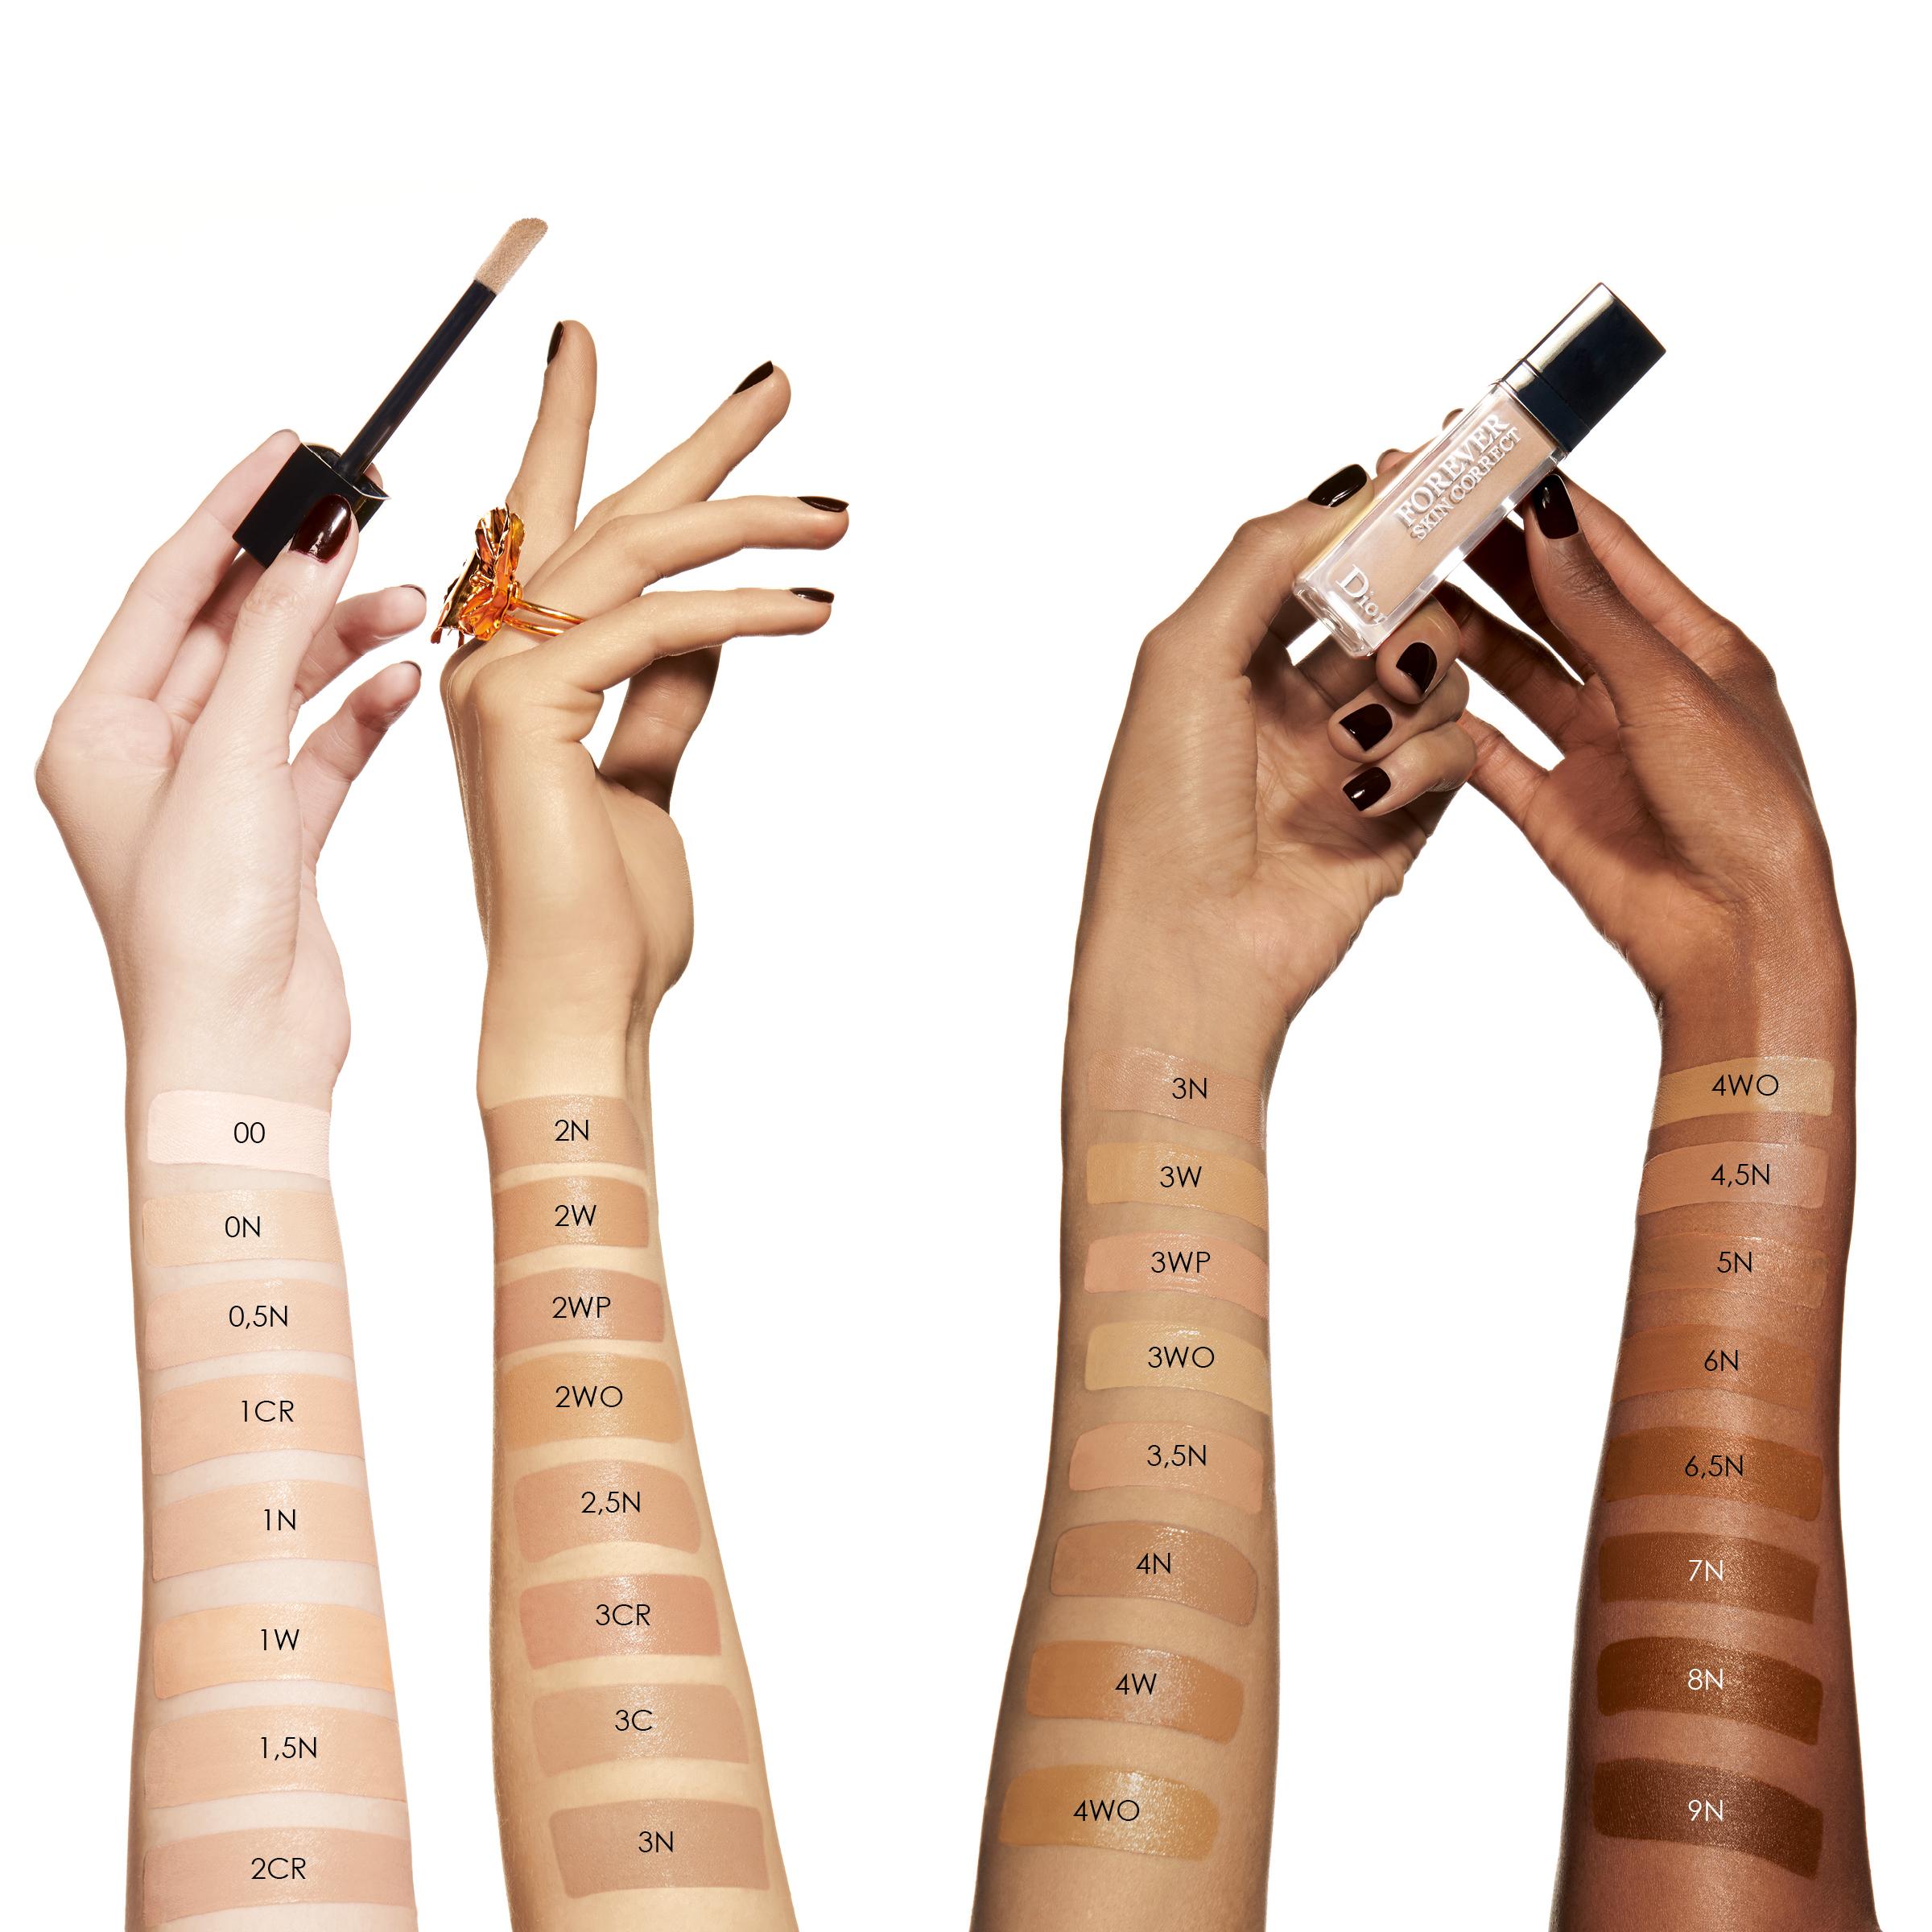 DIOR Forever Skin Correct, 4N